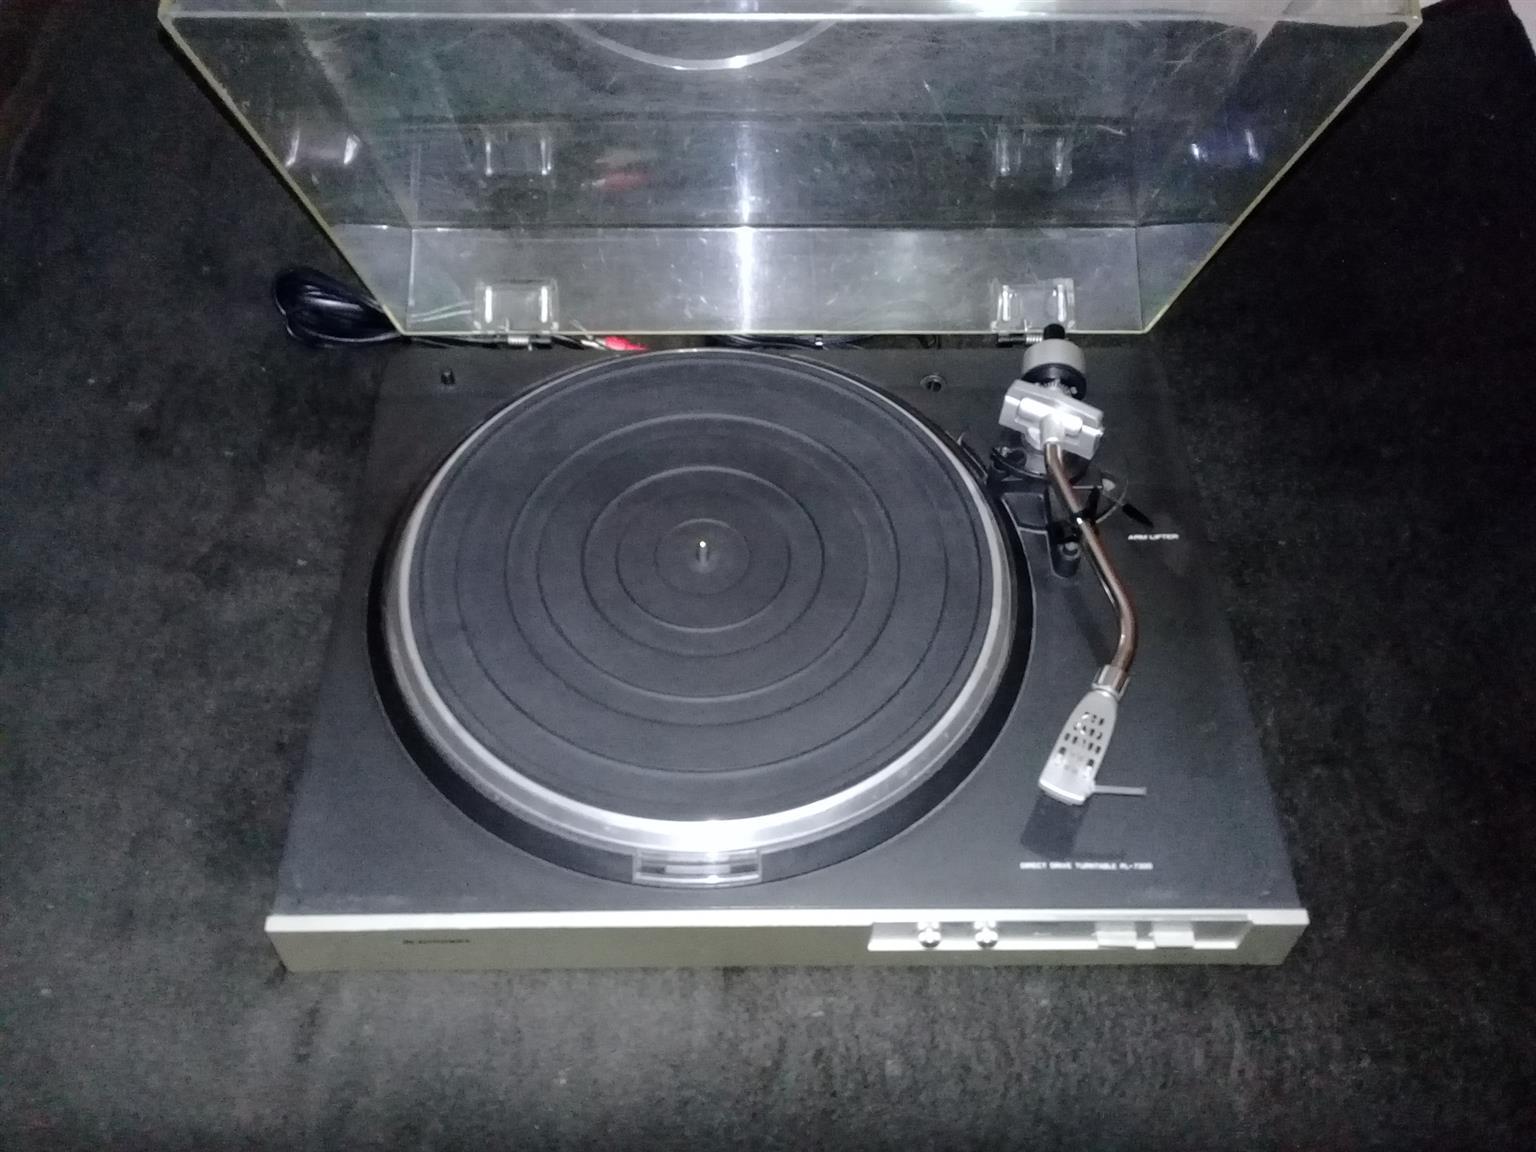 BLAUPUNKT PL7300 RECORD PLAYER